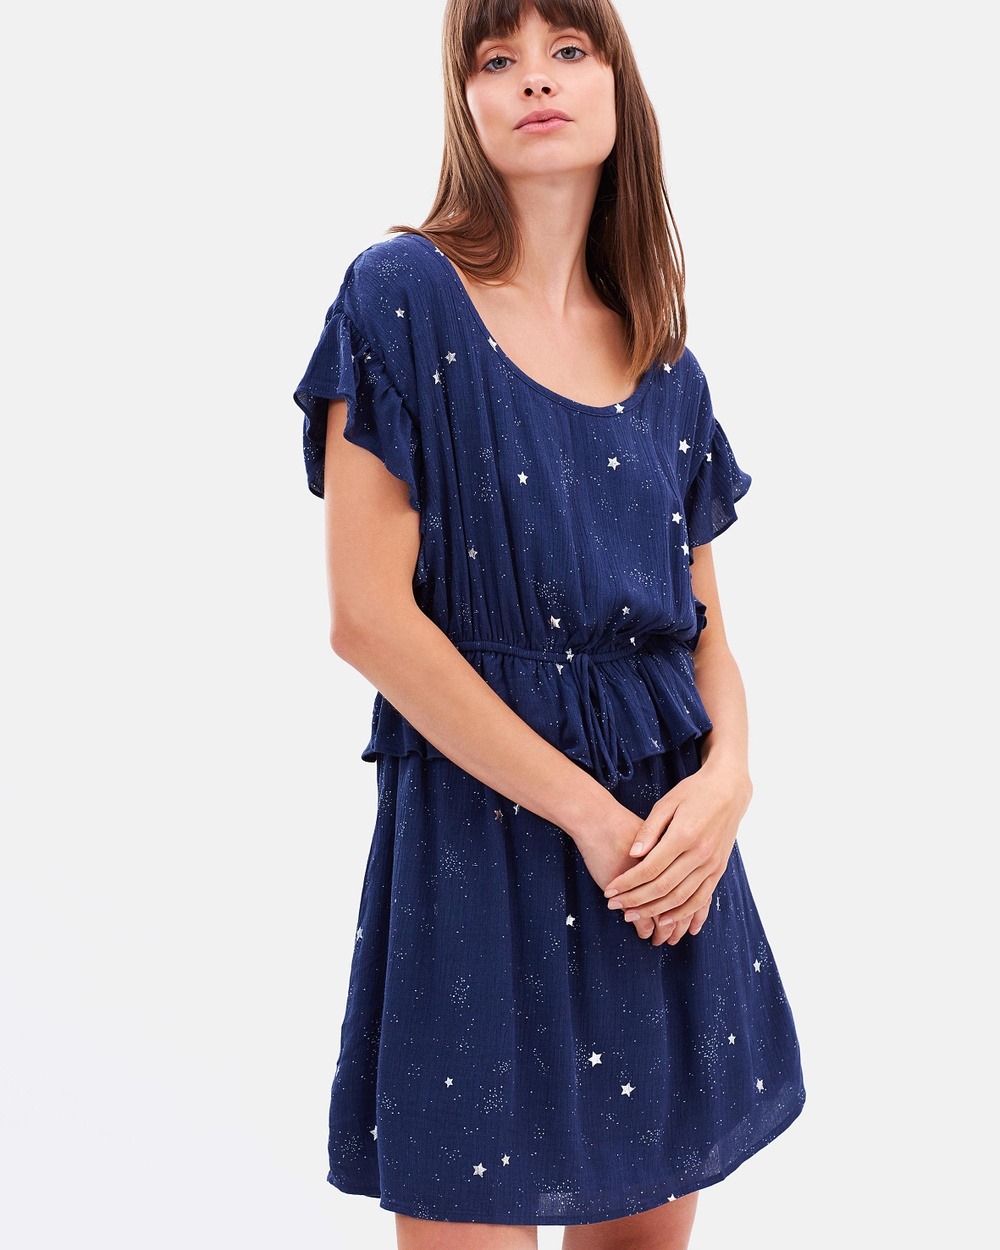 Sass Celestial Stars Ruffle Dress Printed Dresses Celestial Stars Print Celestial Stars Ruffle Dress